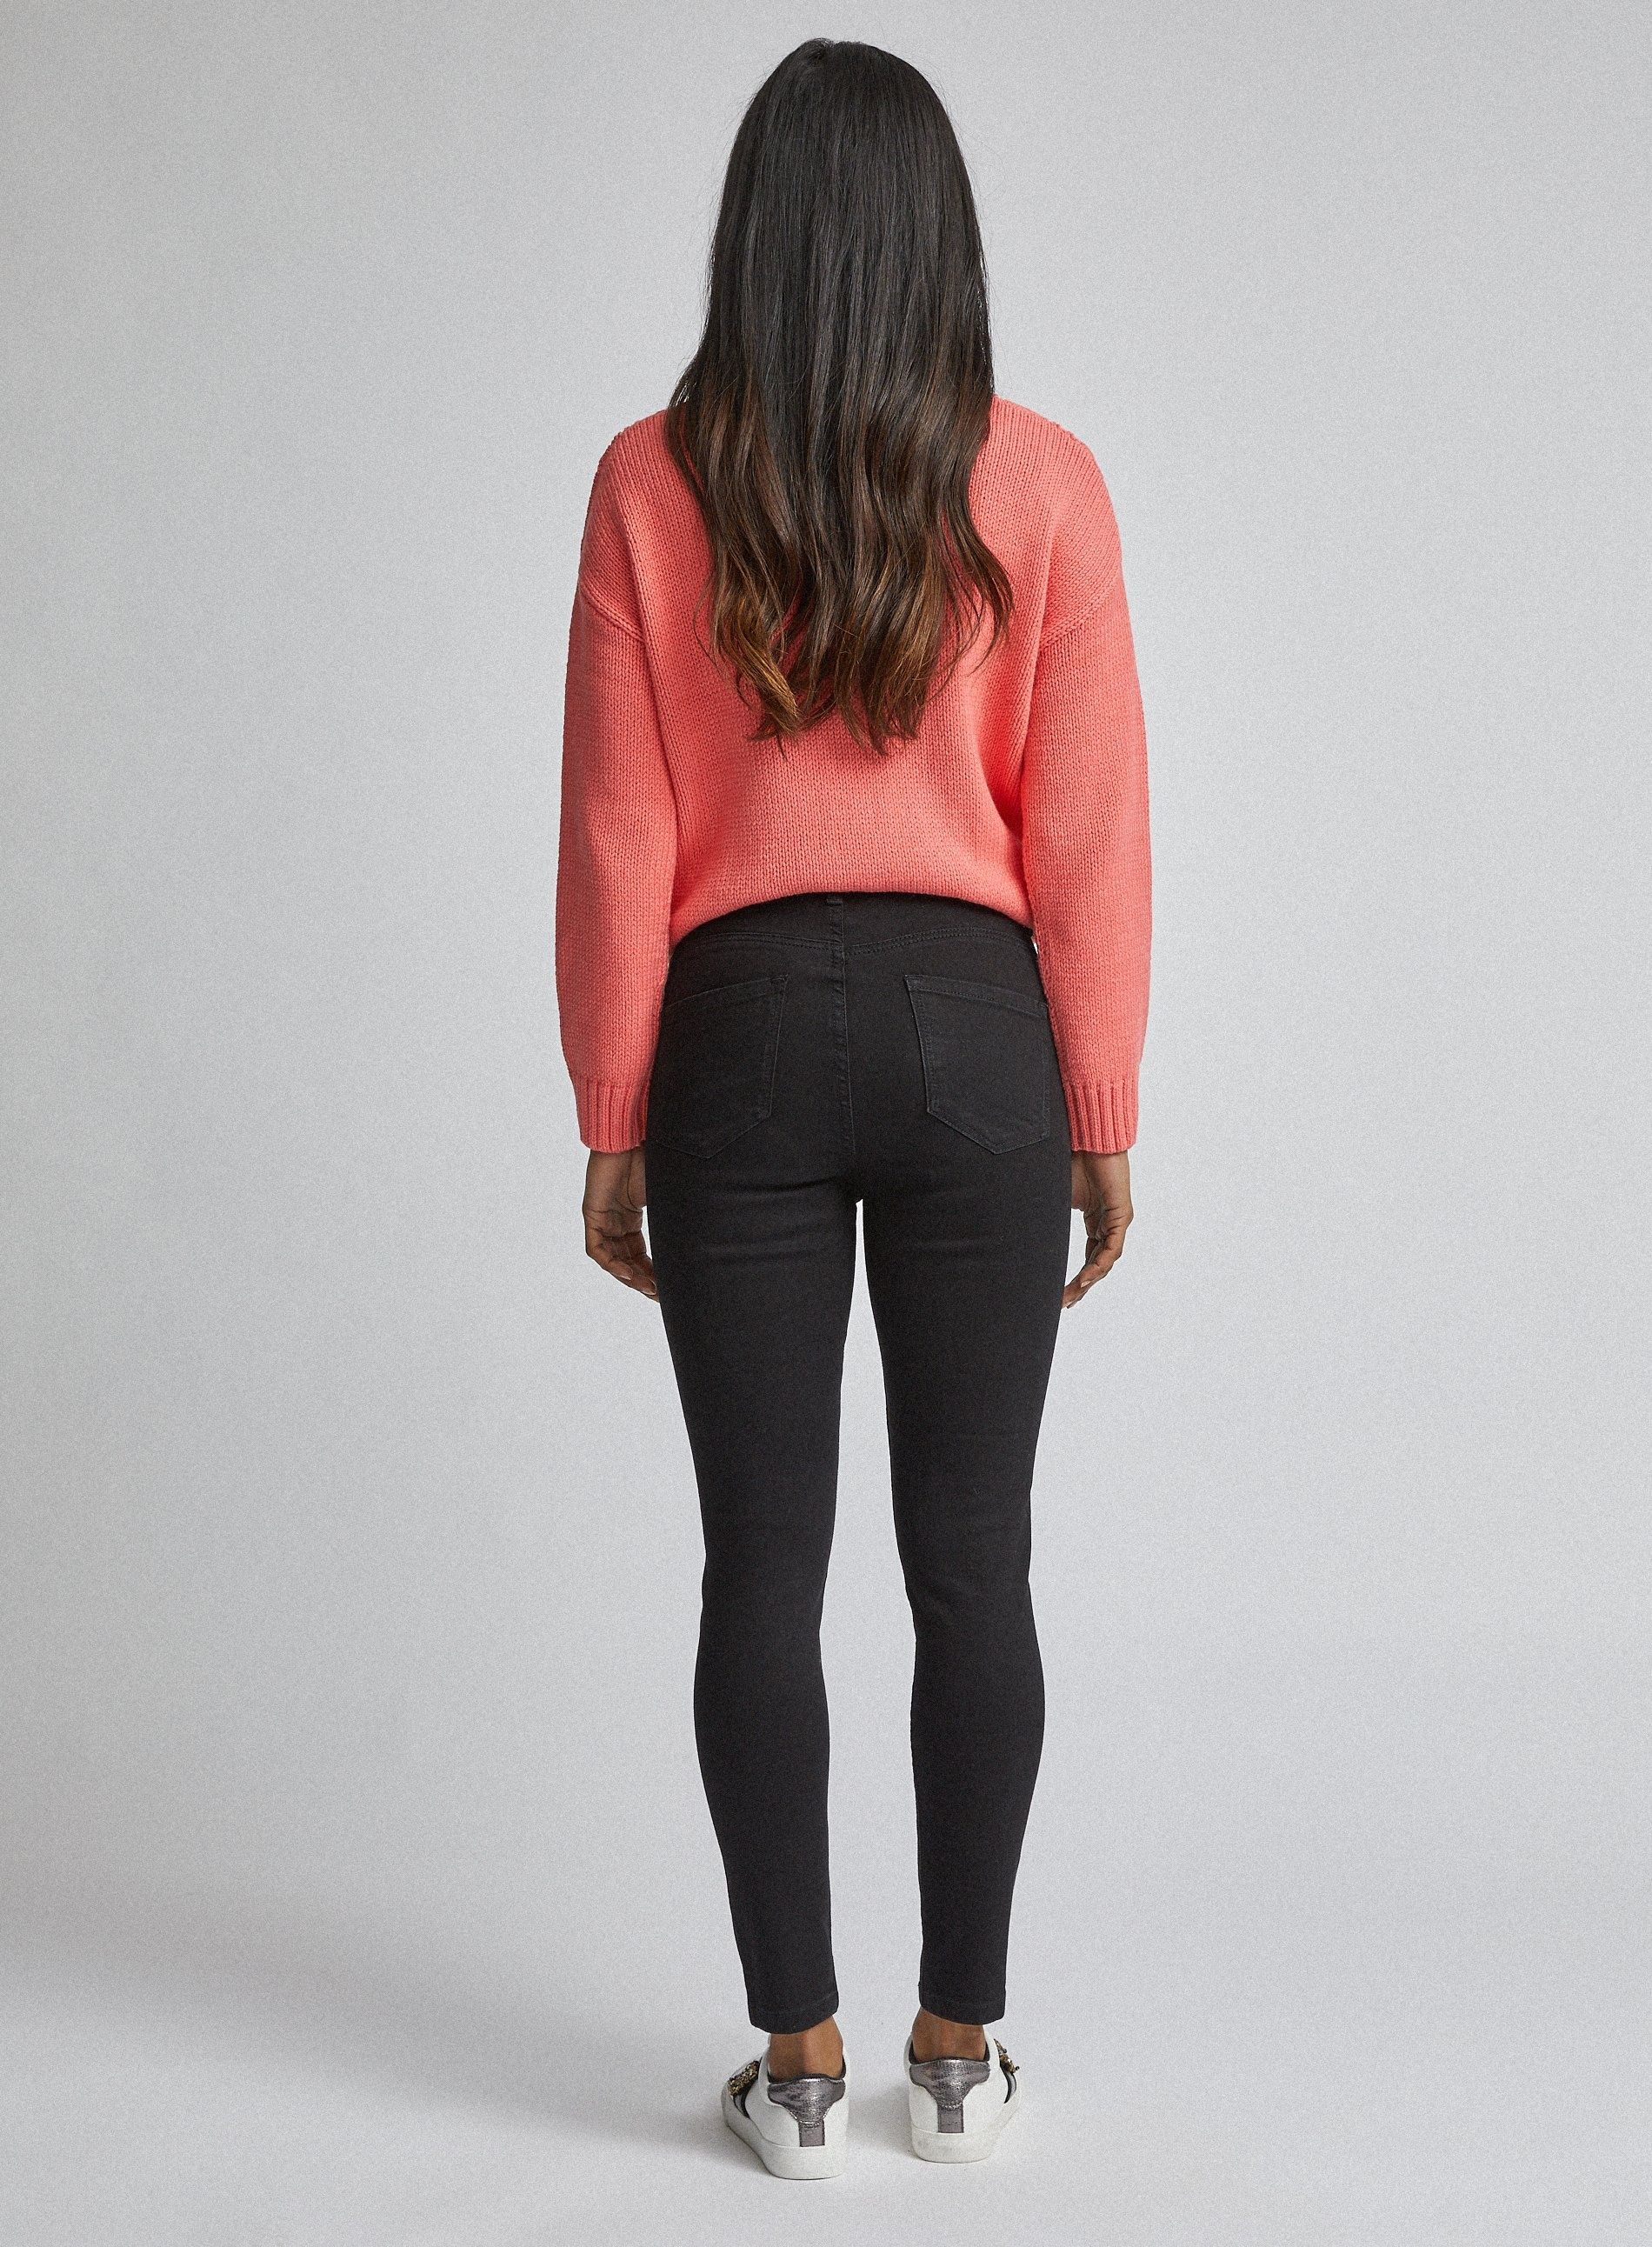 Dorothy Perkins Womens Petite Black 'Shape And Lift' Shaping Jeans Skinny Pants